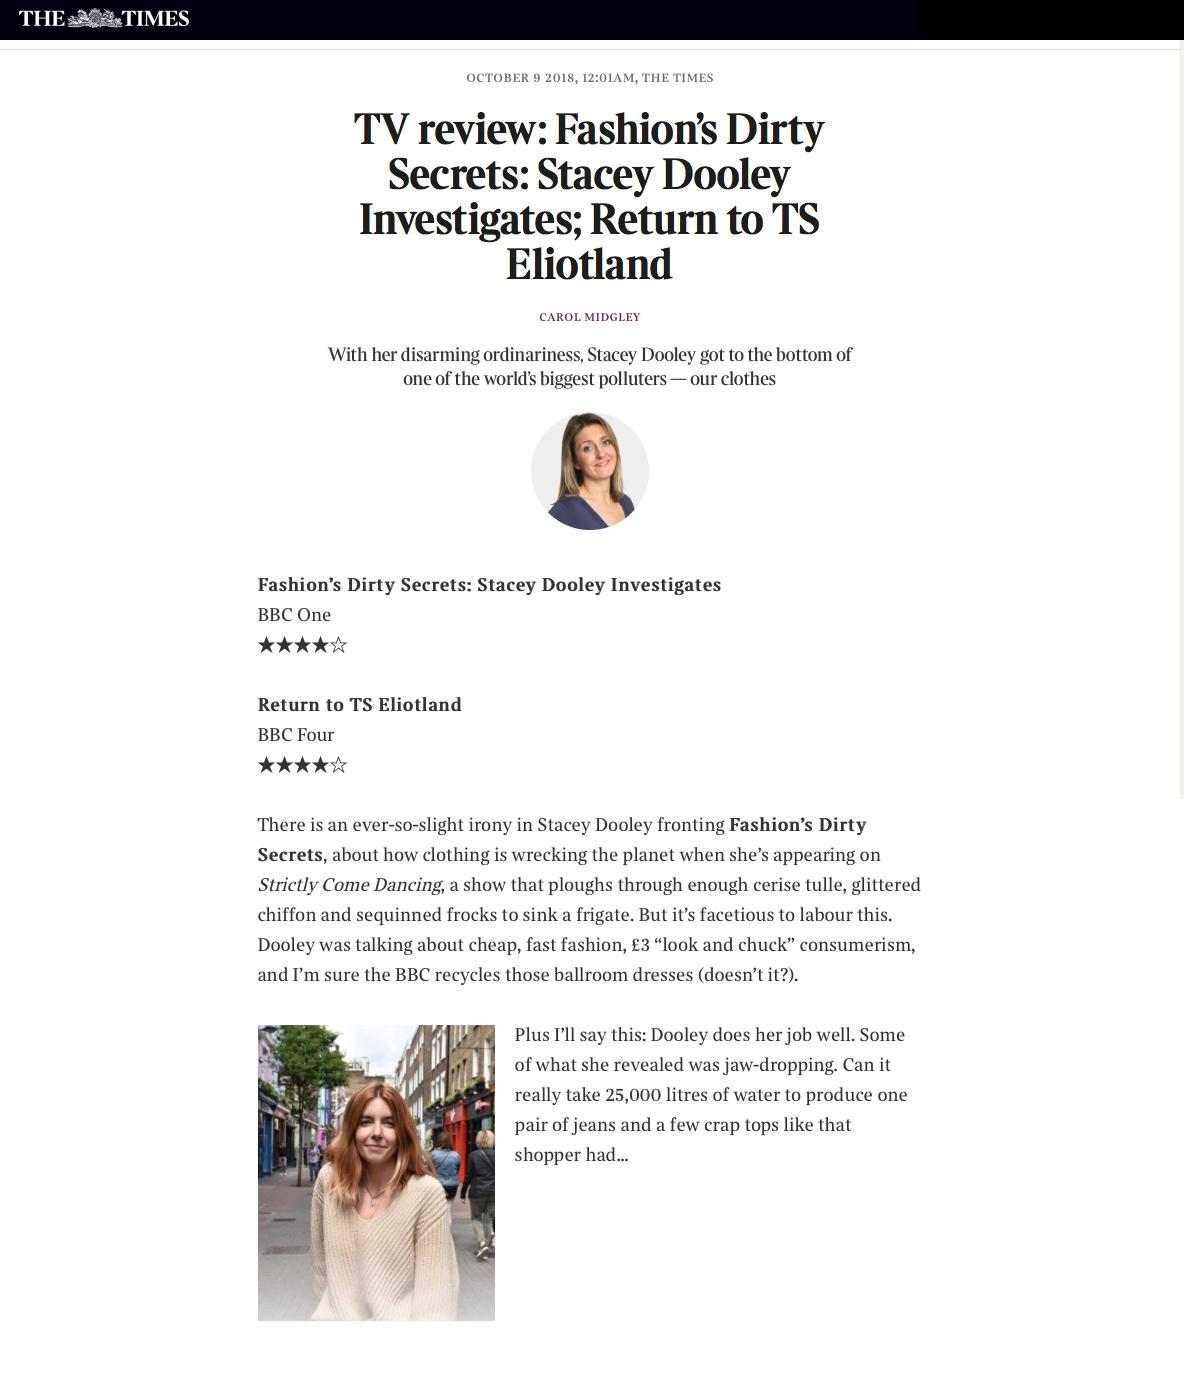 FASHIONS-DIRTY-SECRETS--TIMES-REVIEW-01.jpg